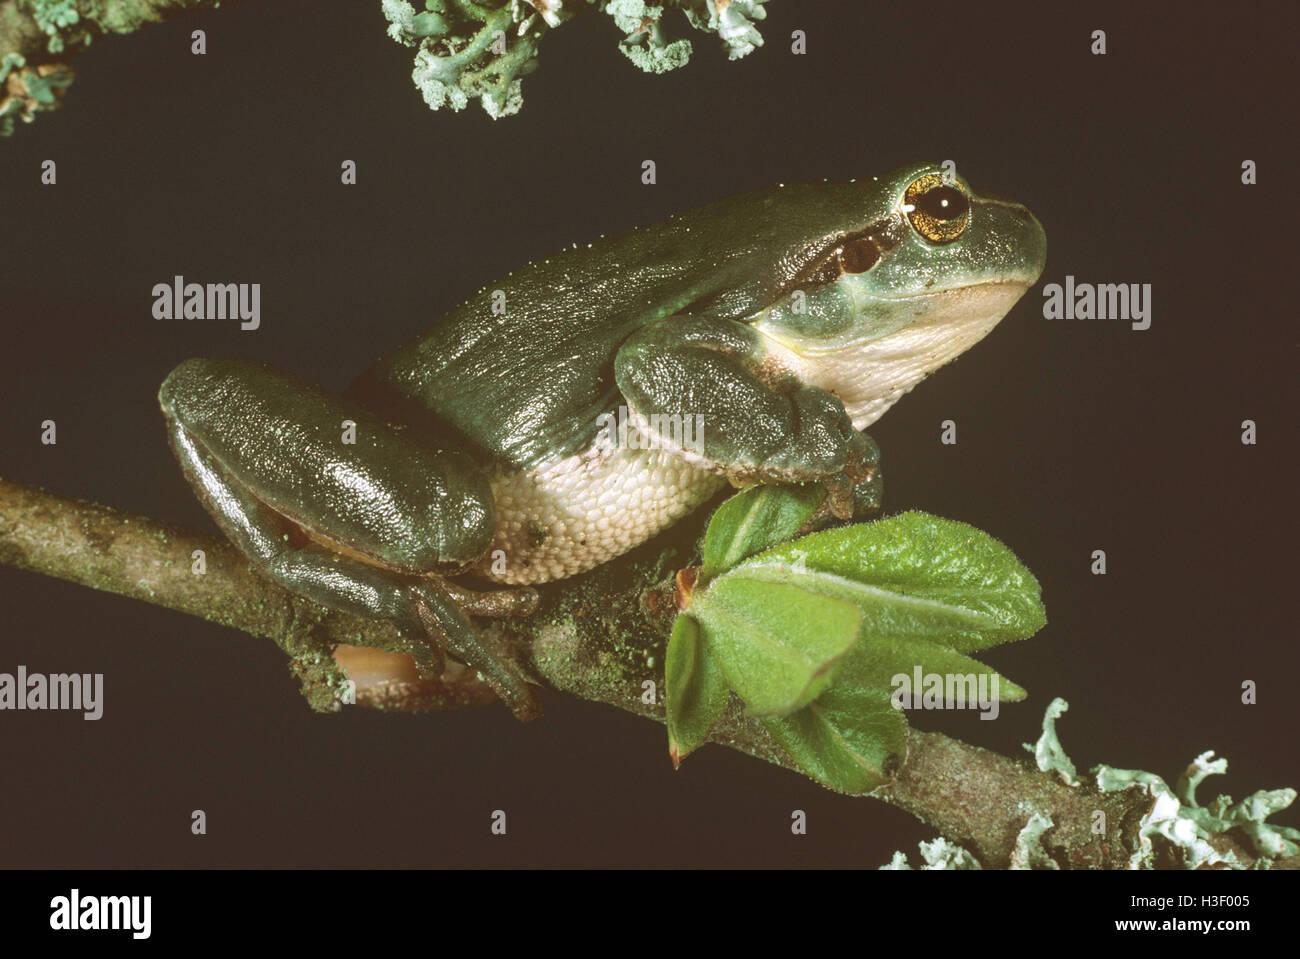 European tree frog (Hyla arborea) - Stock Image